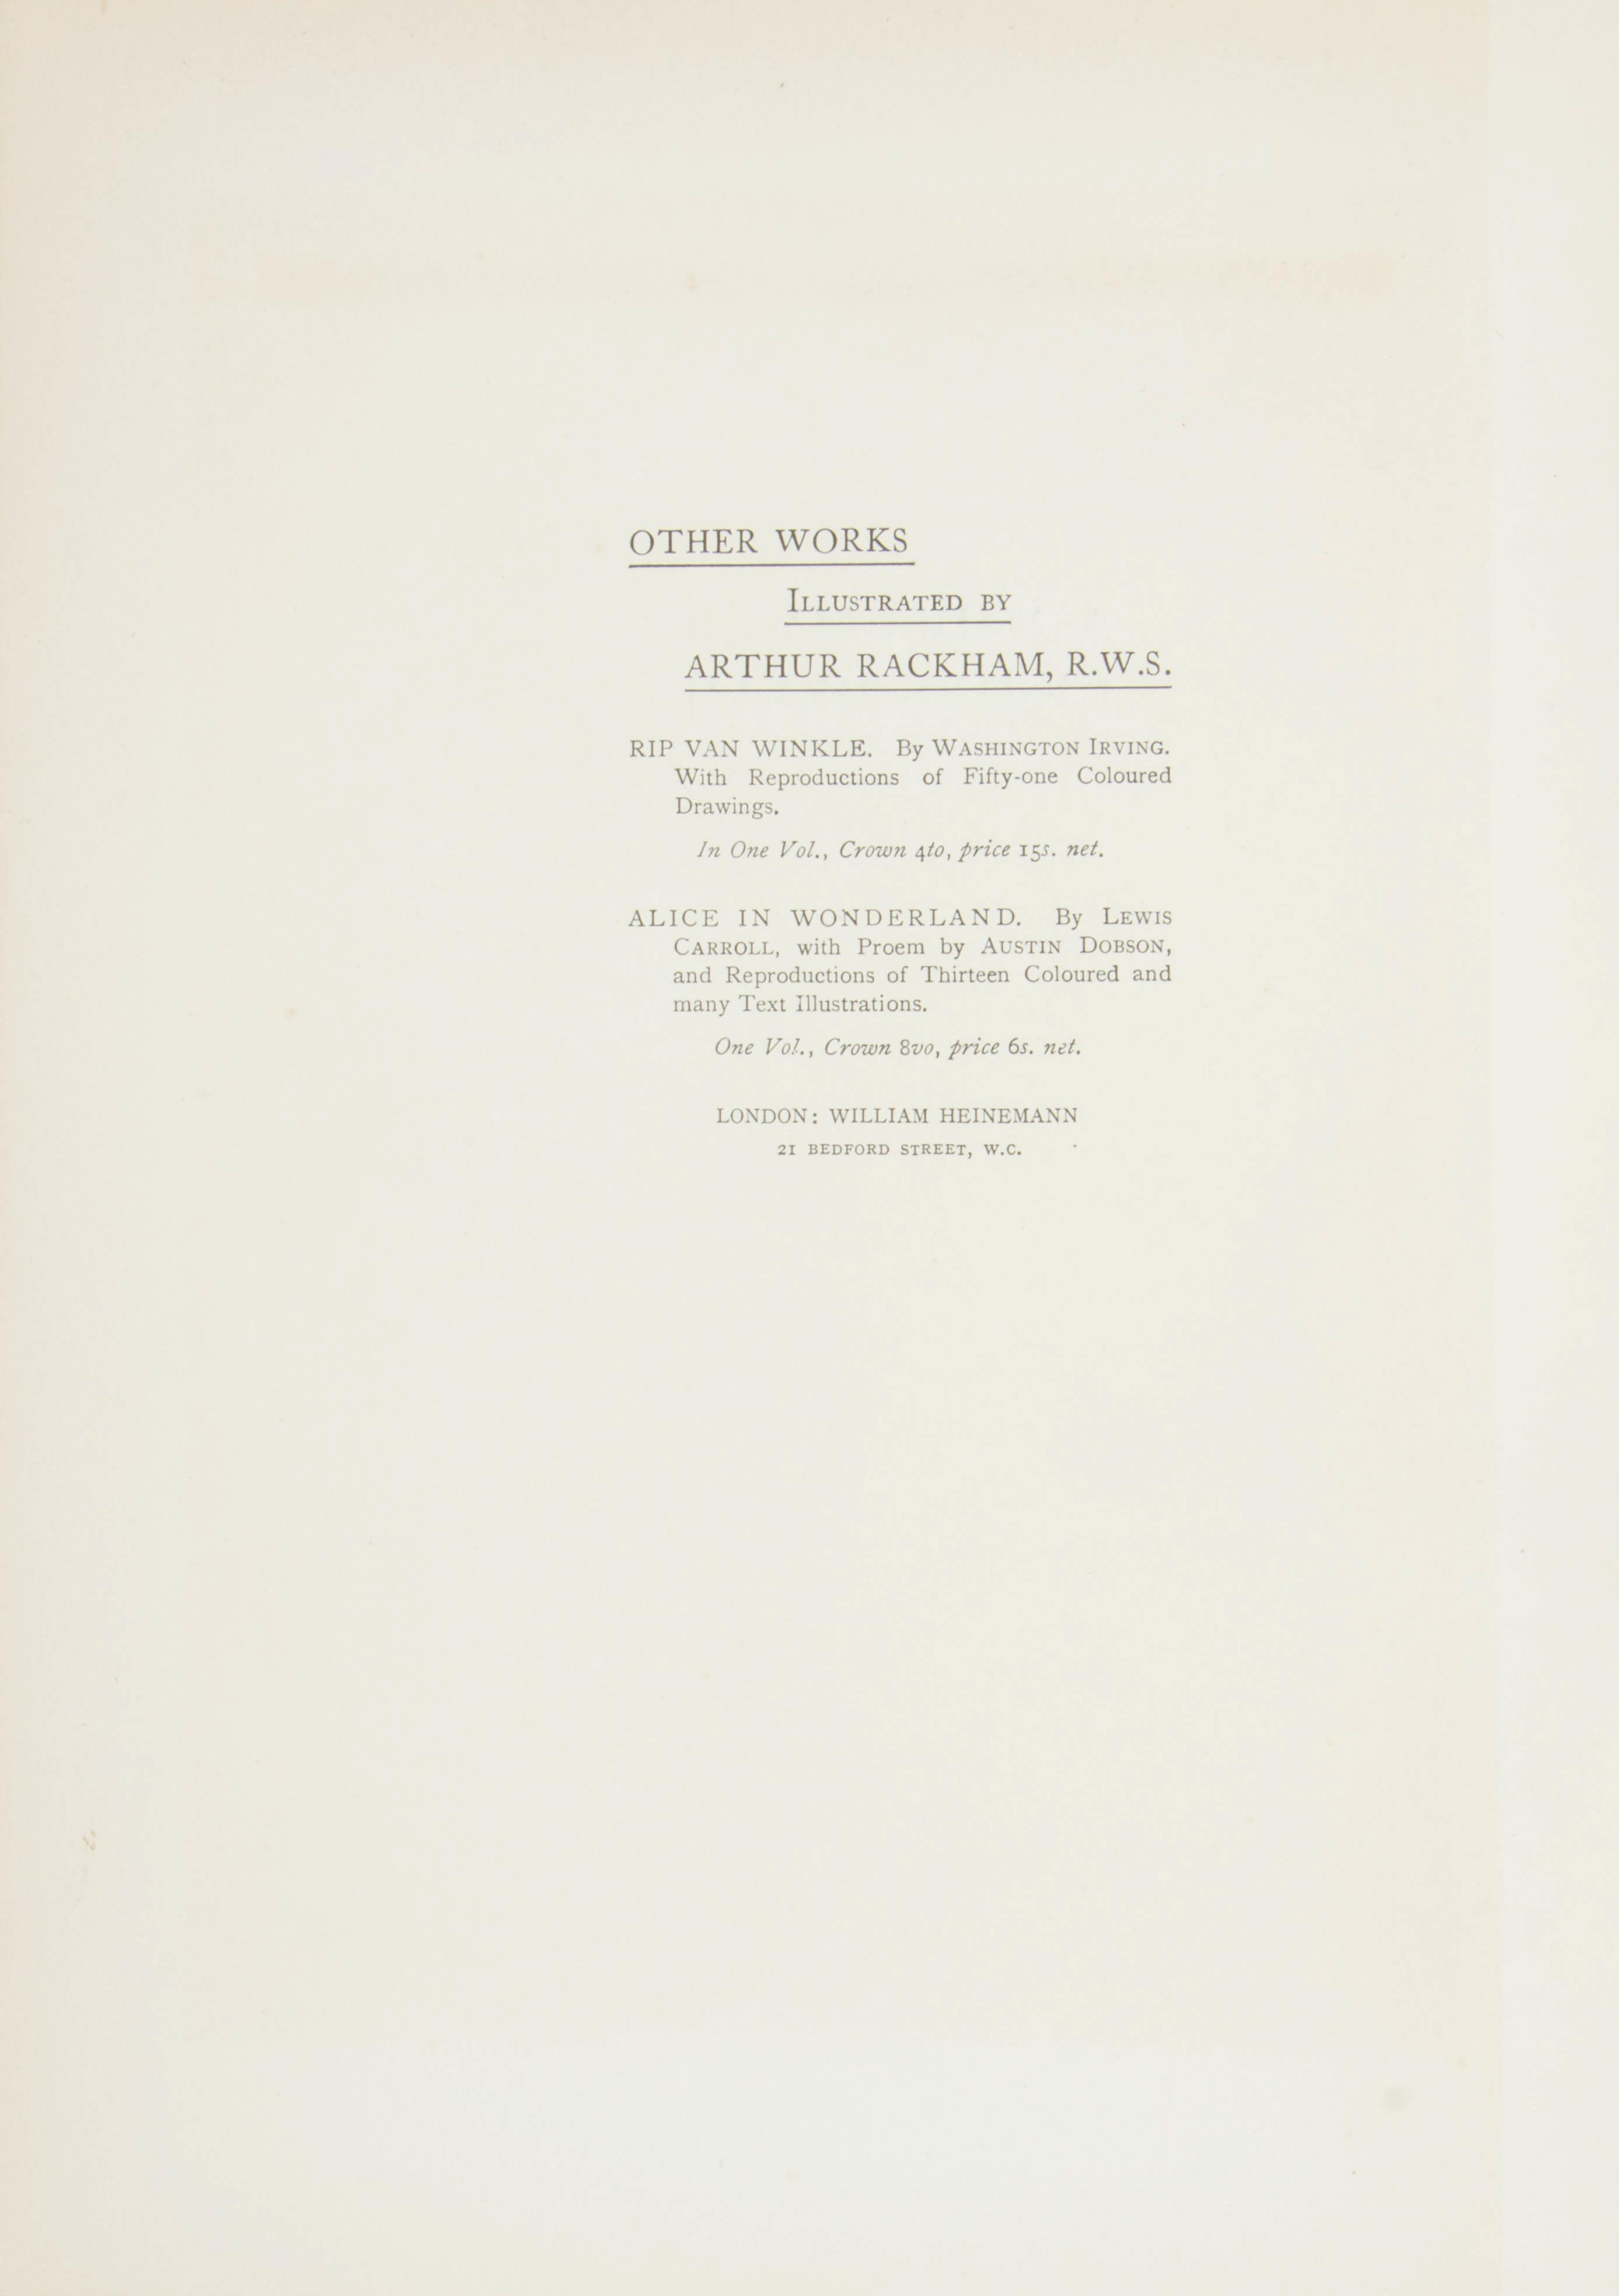 1908 MIDSUMMER NIGHT'S DREAM BY WILLIAM SHAKESPEARE, ILLUSTRATIONS BY ARTHUR RACKHAM - Image 3 of 7